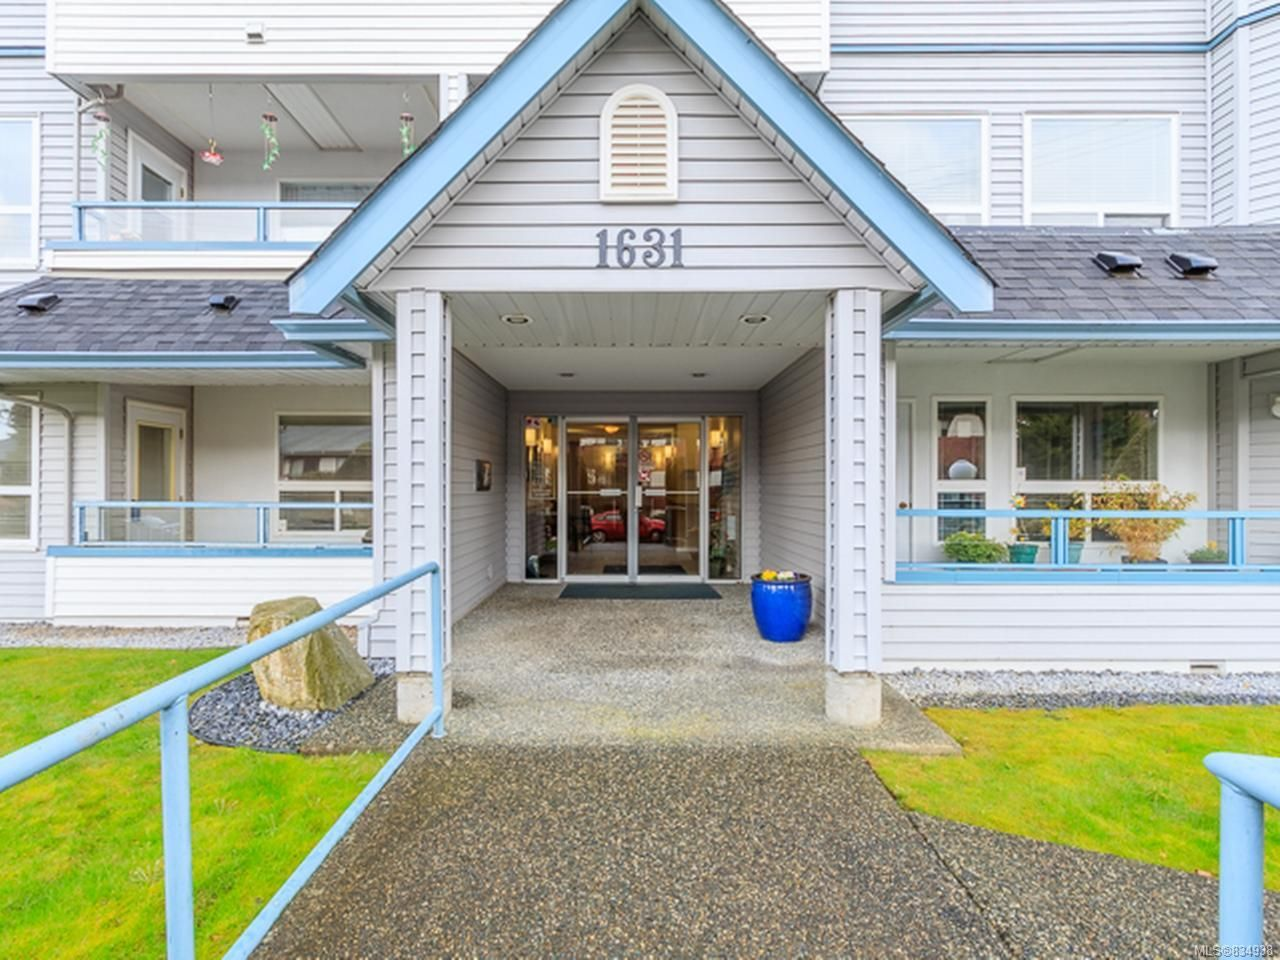 Main Photo: 109 1631 Dufferin Cres in NANAIMO: Na Central Nanaimo Condo for sale (Nanaimo)  : MLS®# 834938